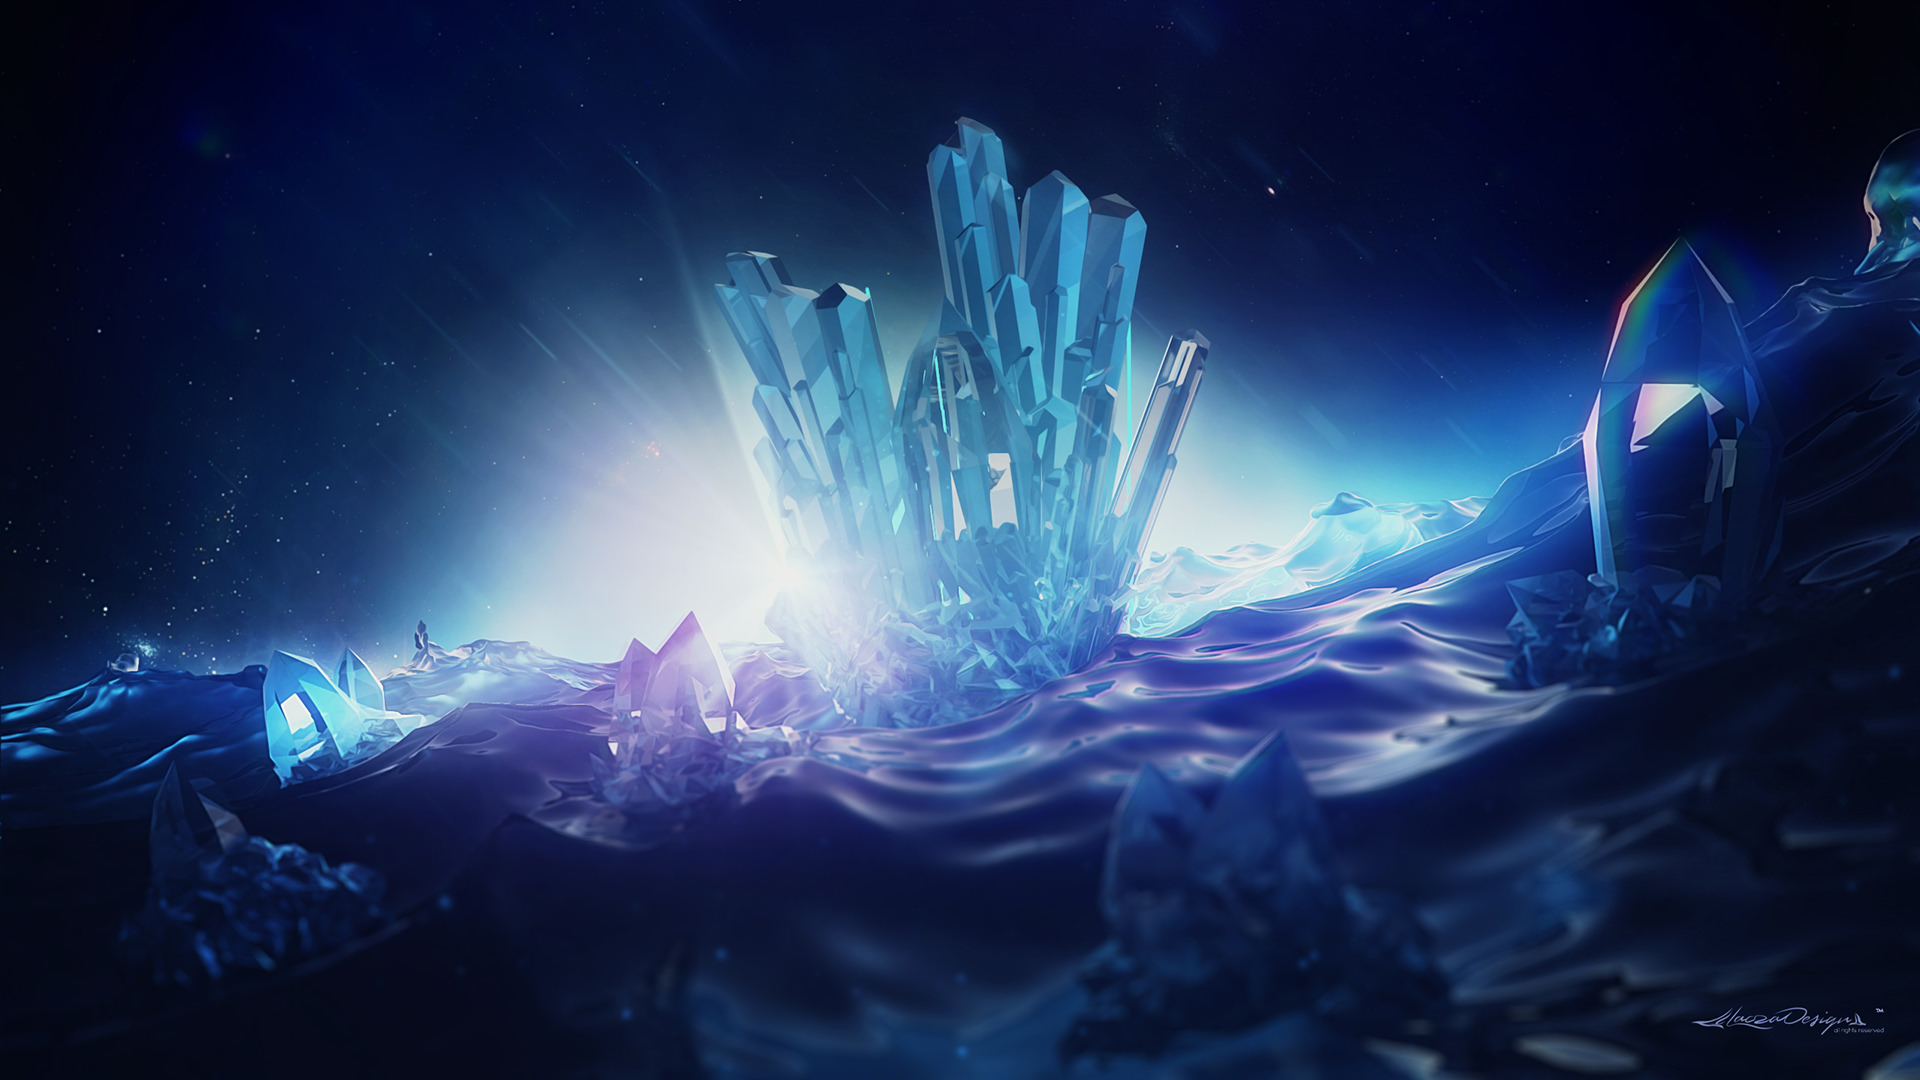 Crystal Widescreen HD Wallpaper